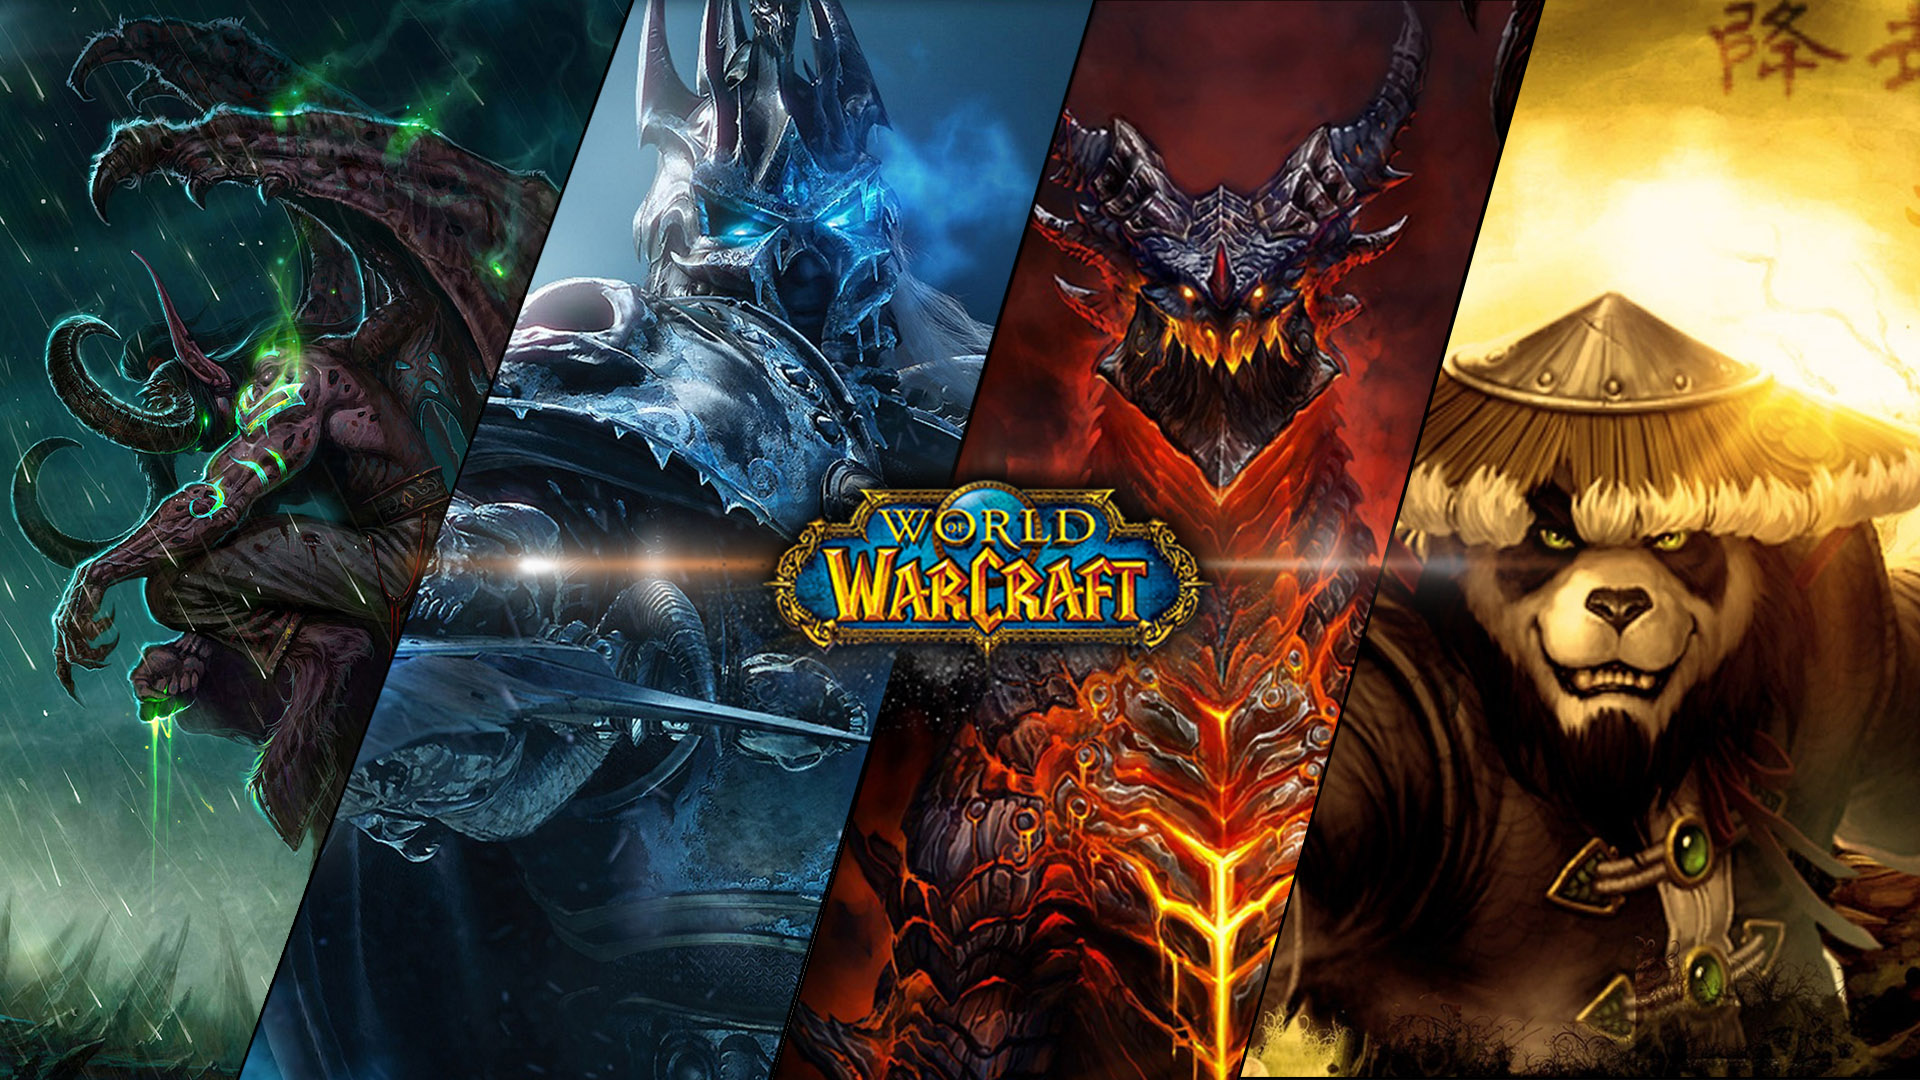 Wow Wallpapers Hd World Of Warcraft Wallpaper Hd 2221723 Hd